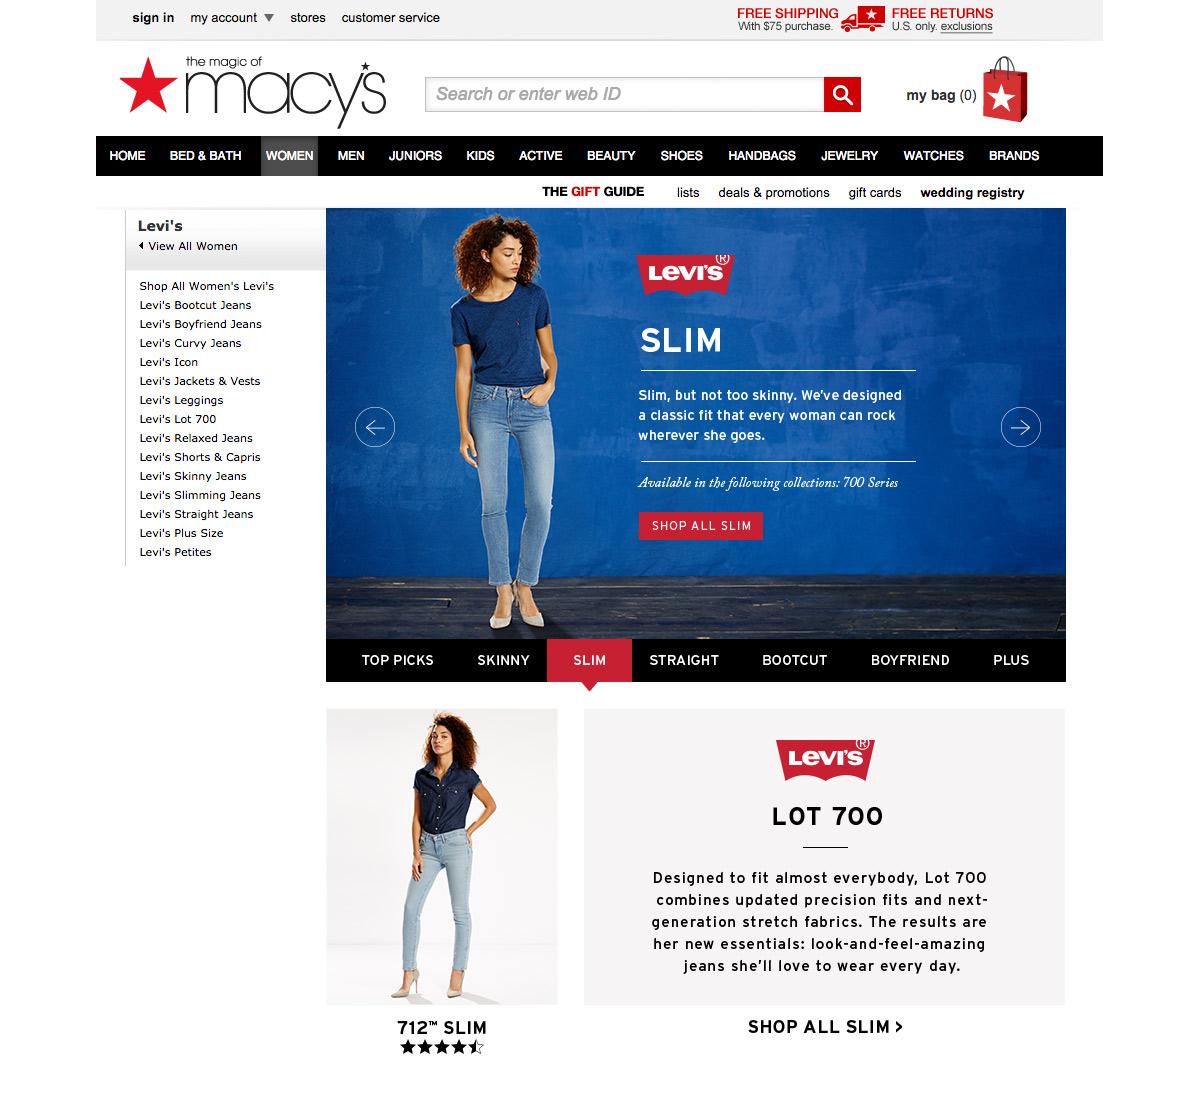 15LEV1005_Macys_BrandShop_Spring15_AL_slim